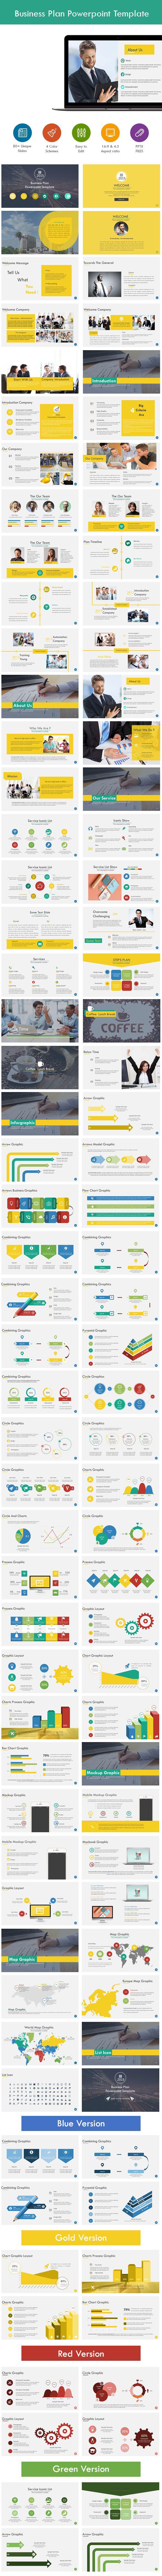 business plan powerpoint presentation template slides download